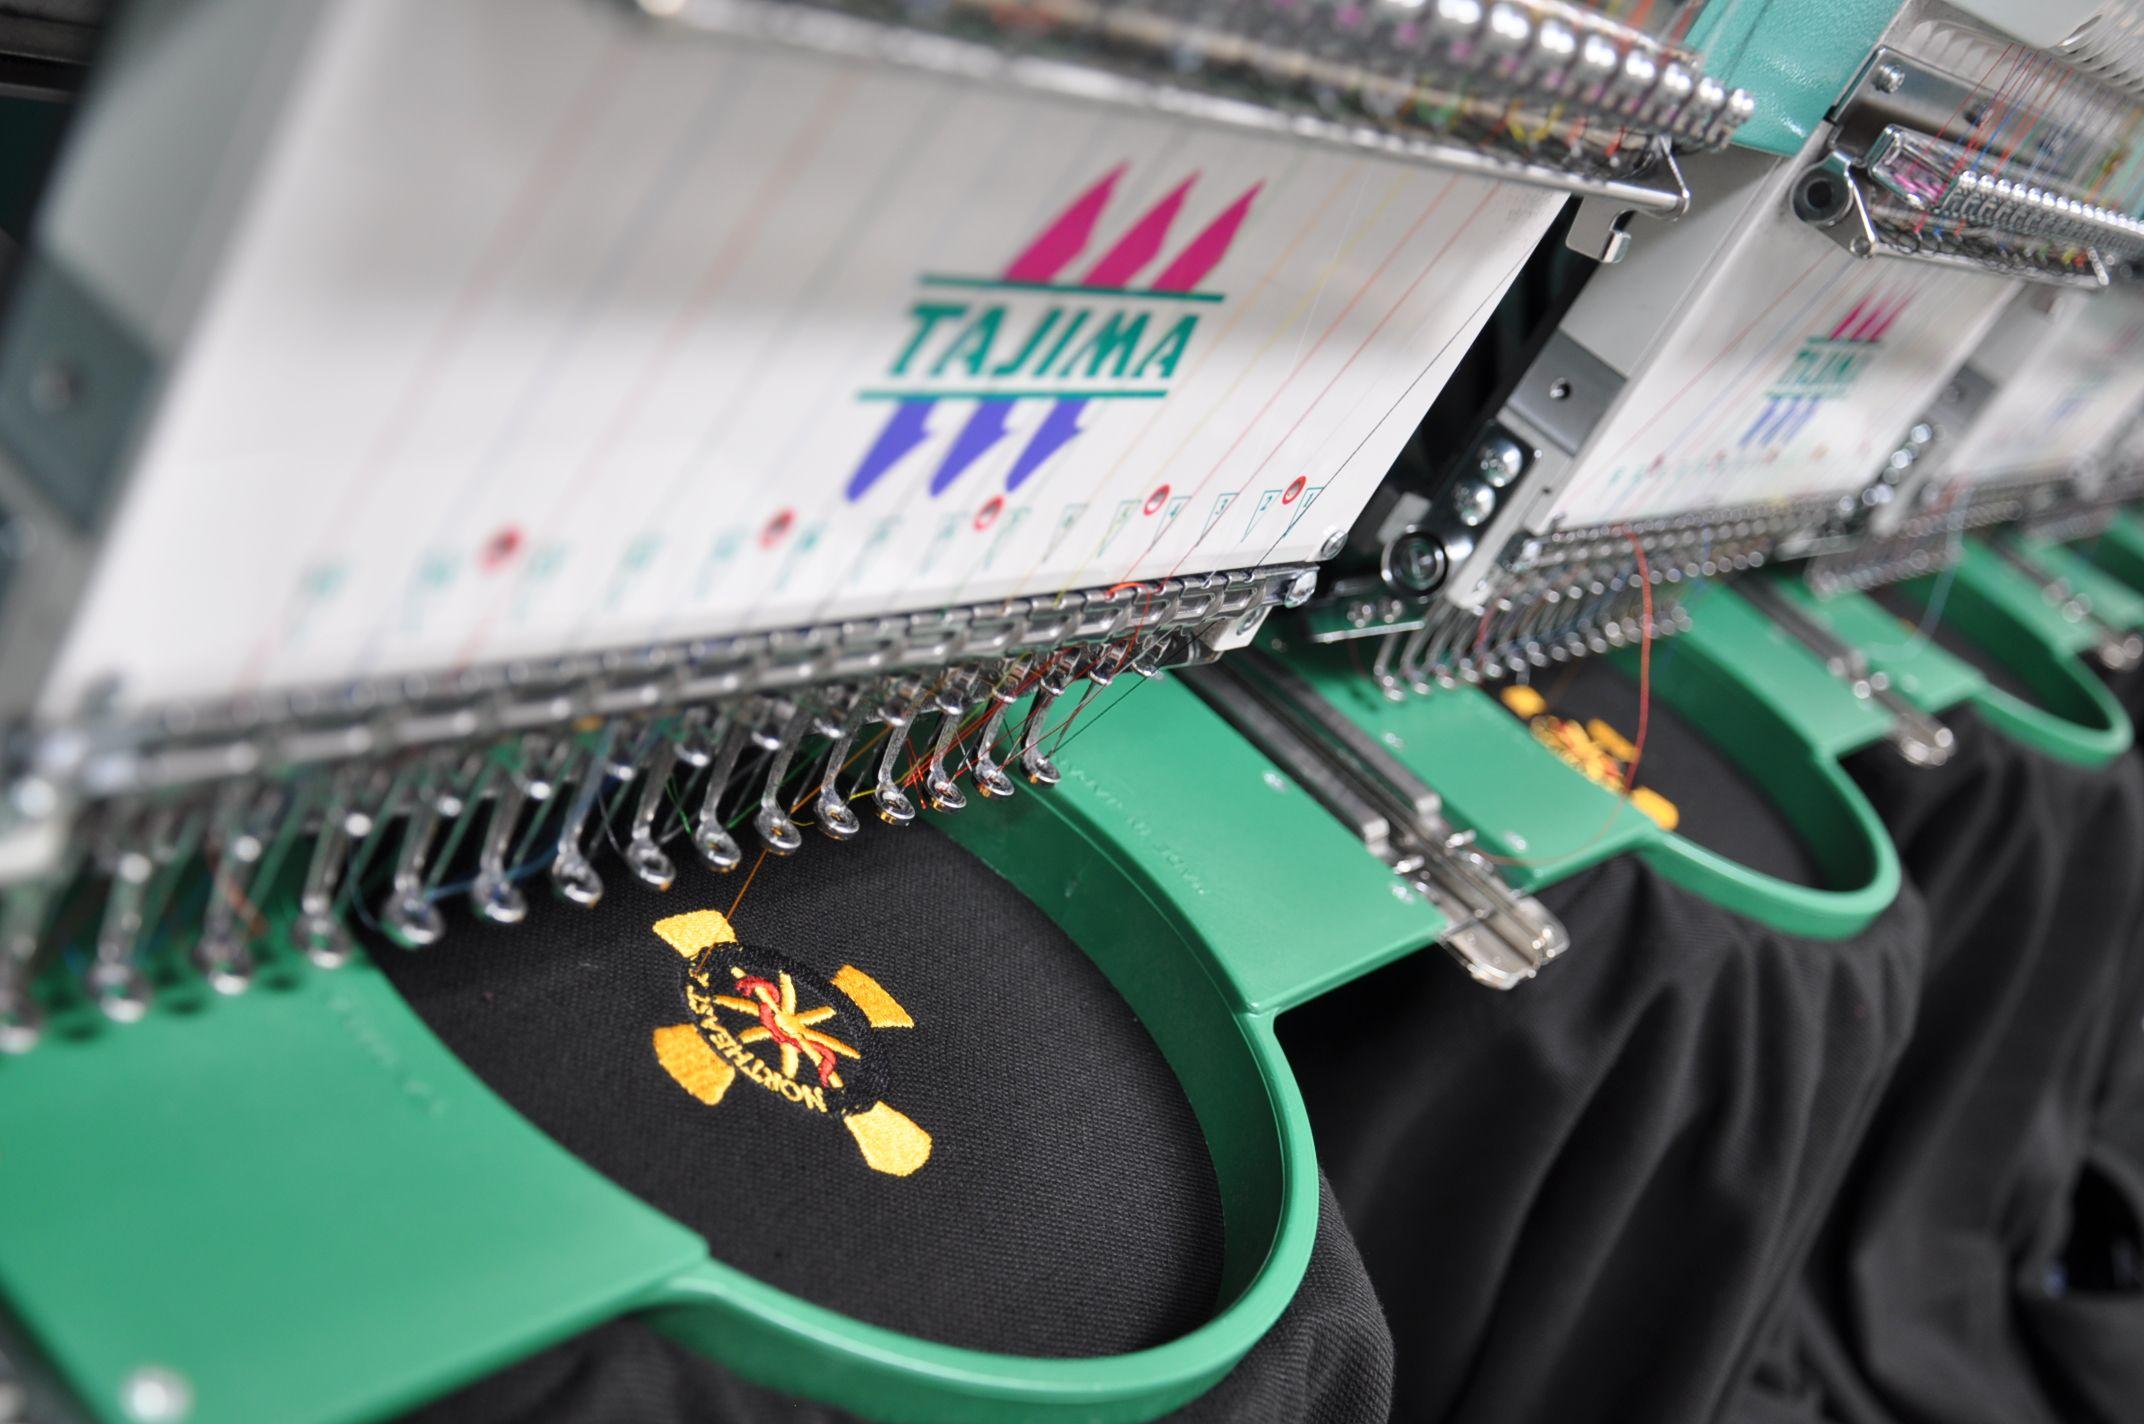 Tajima embroidery machine   Tajima embroidery machine, Tajima embroidery,  Fathers day cupcakes